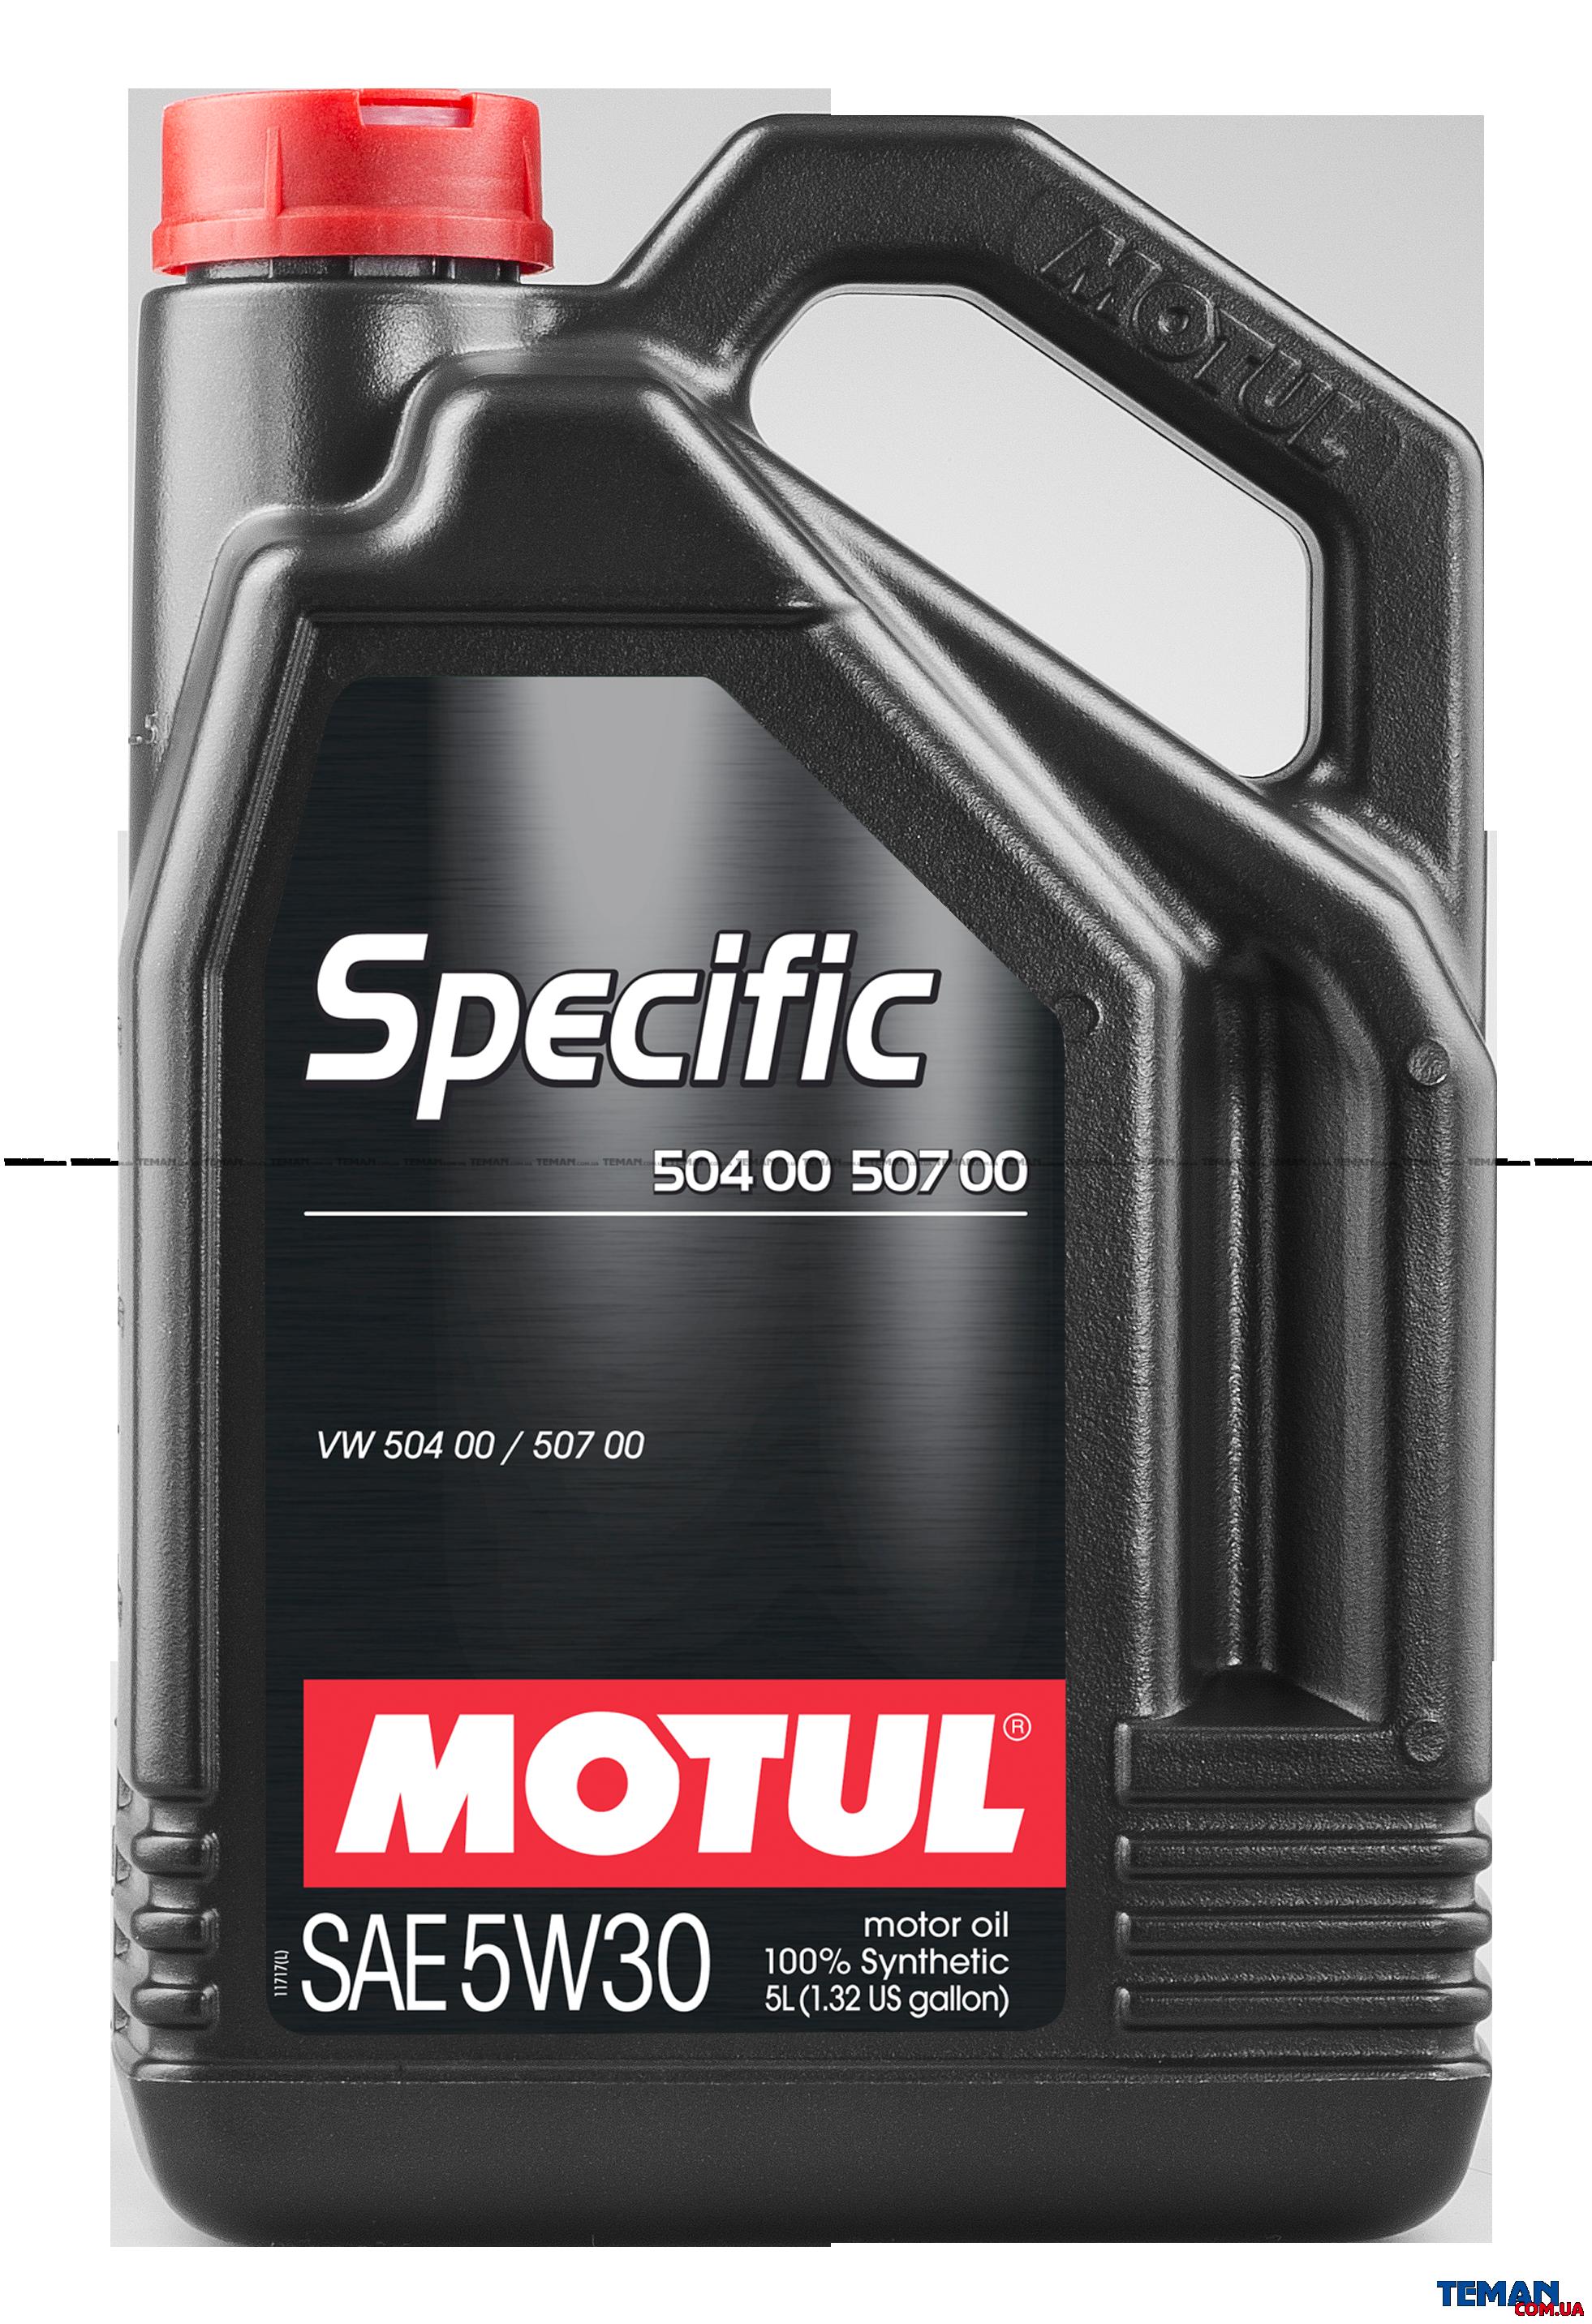 Синтетическое моторное масло SPECIFIC 504 00 - 507 00, 5W-30, 5 л